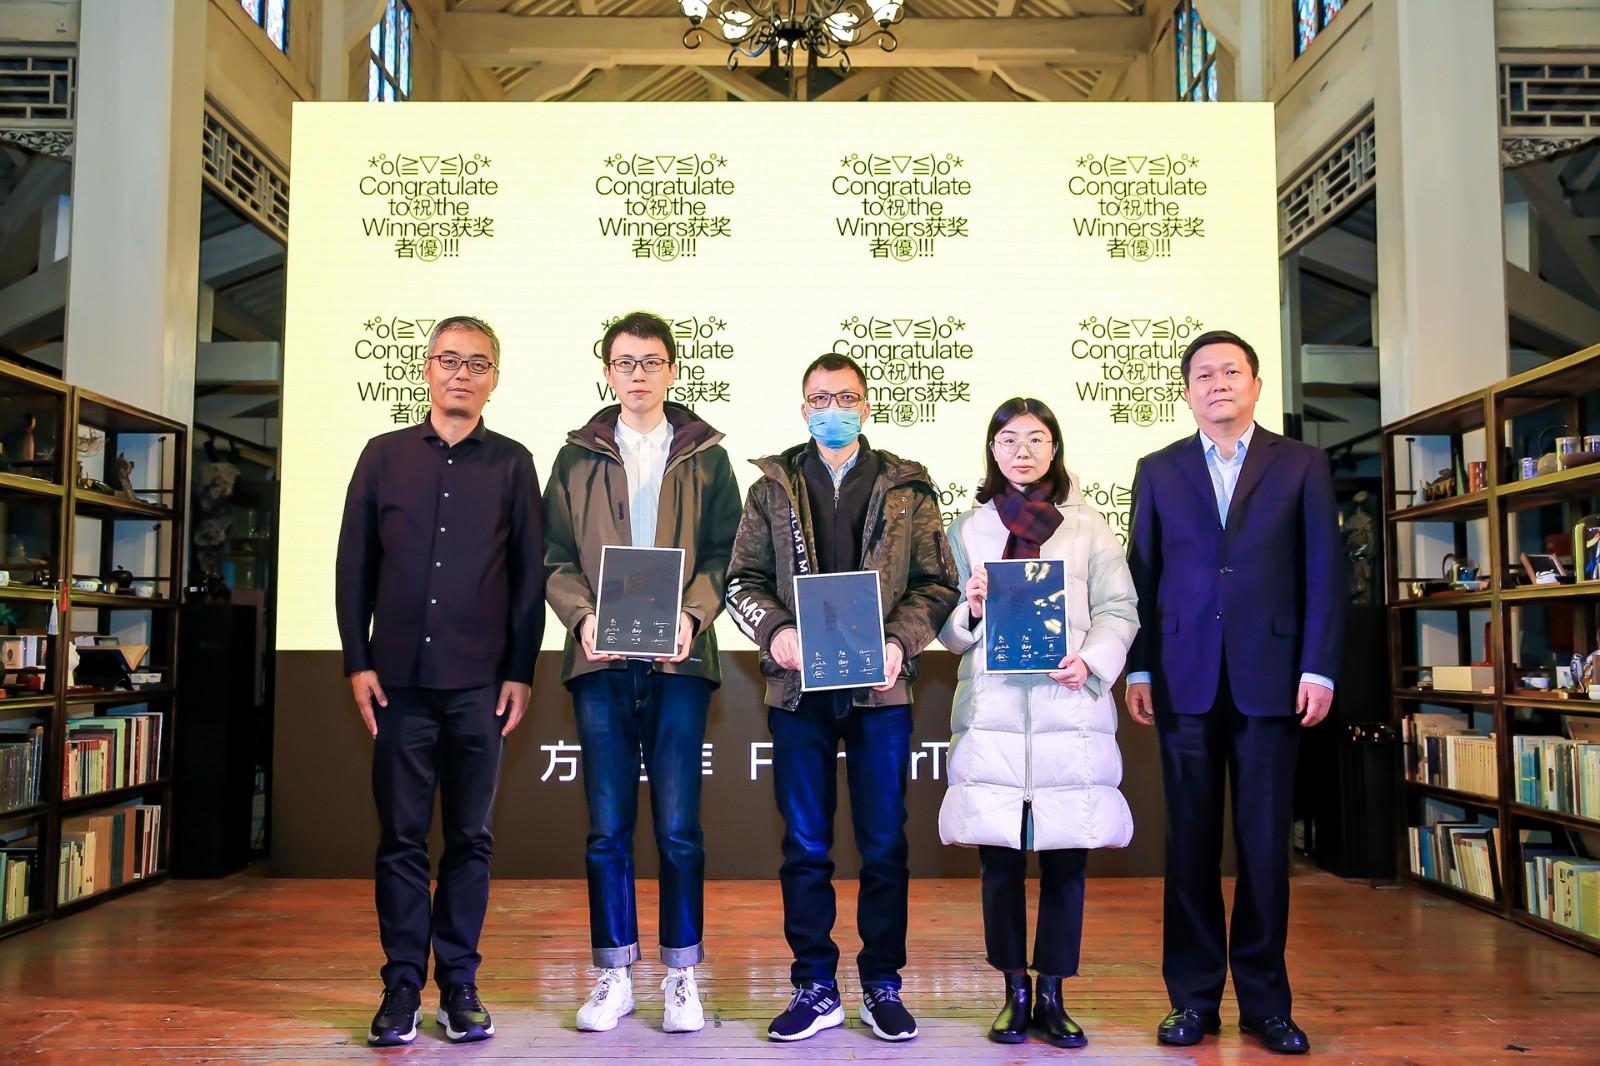 https://ft-bk1.oss-cn-zhangjiakou.aliyuncs.com/Public/Uploads/img/n_content_20201210174343_2718.jpg